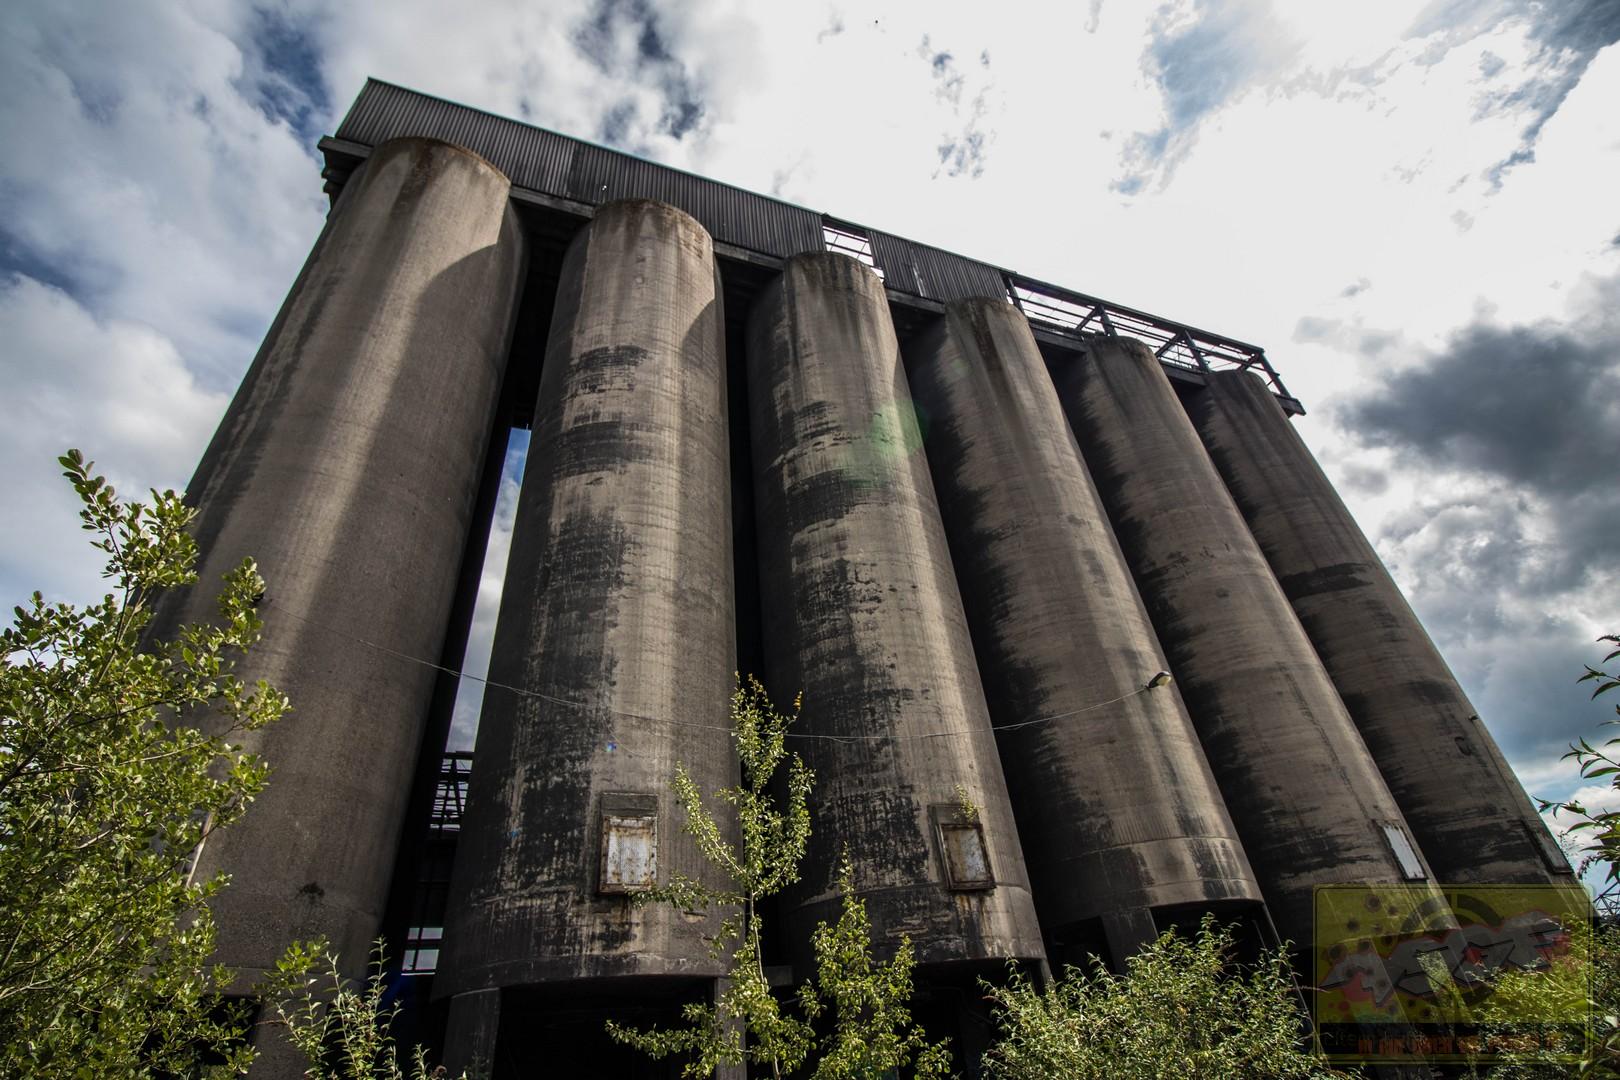 Bauxitfabrik-27.06.2020-12